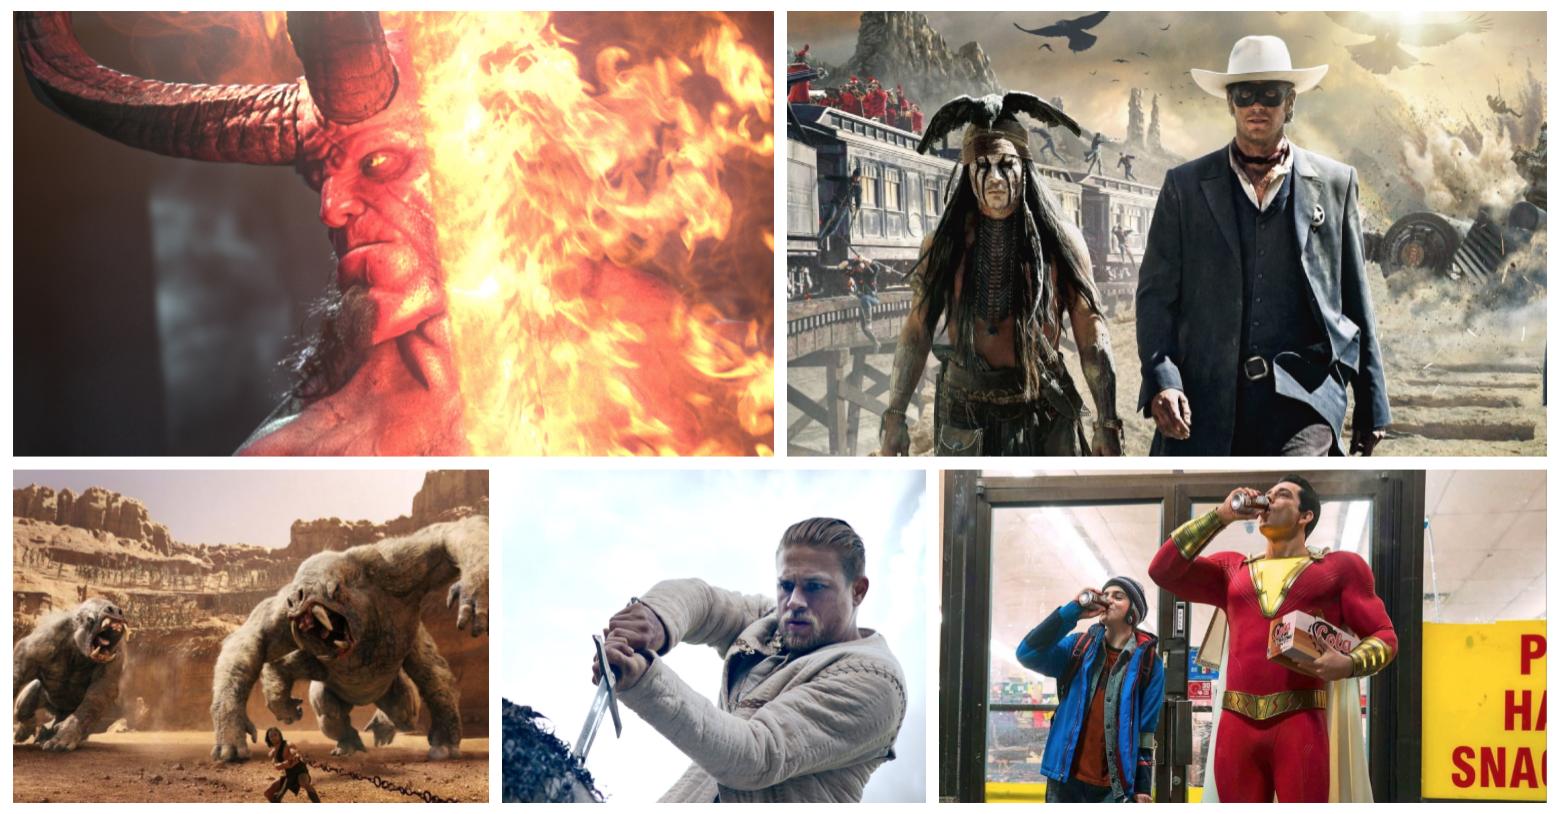 Fracasos injustos del cine mainstream